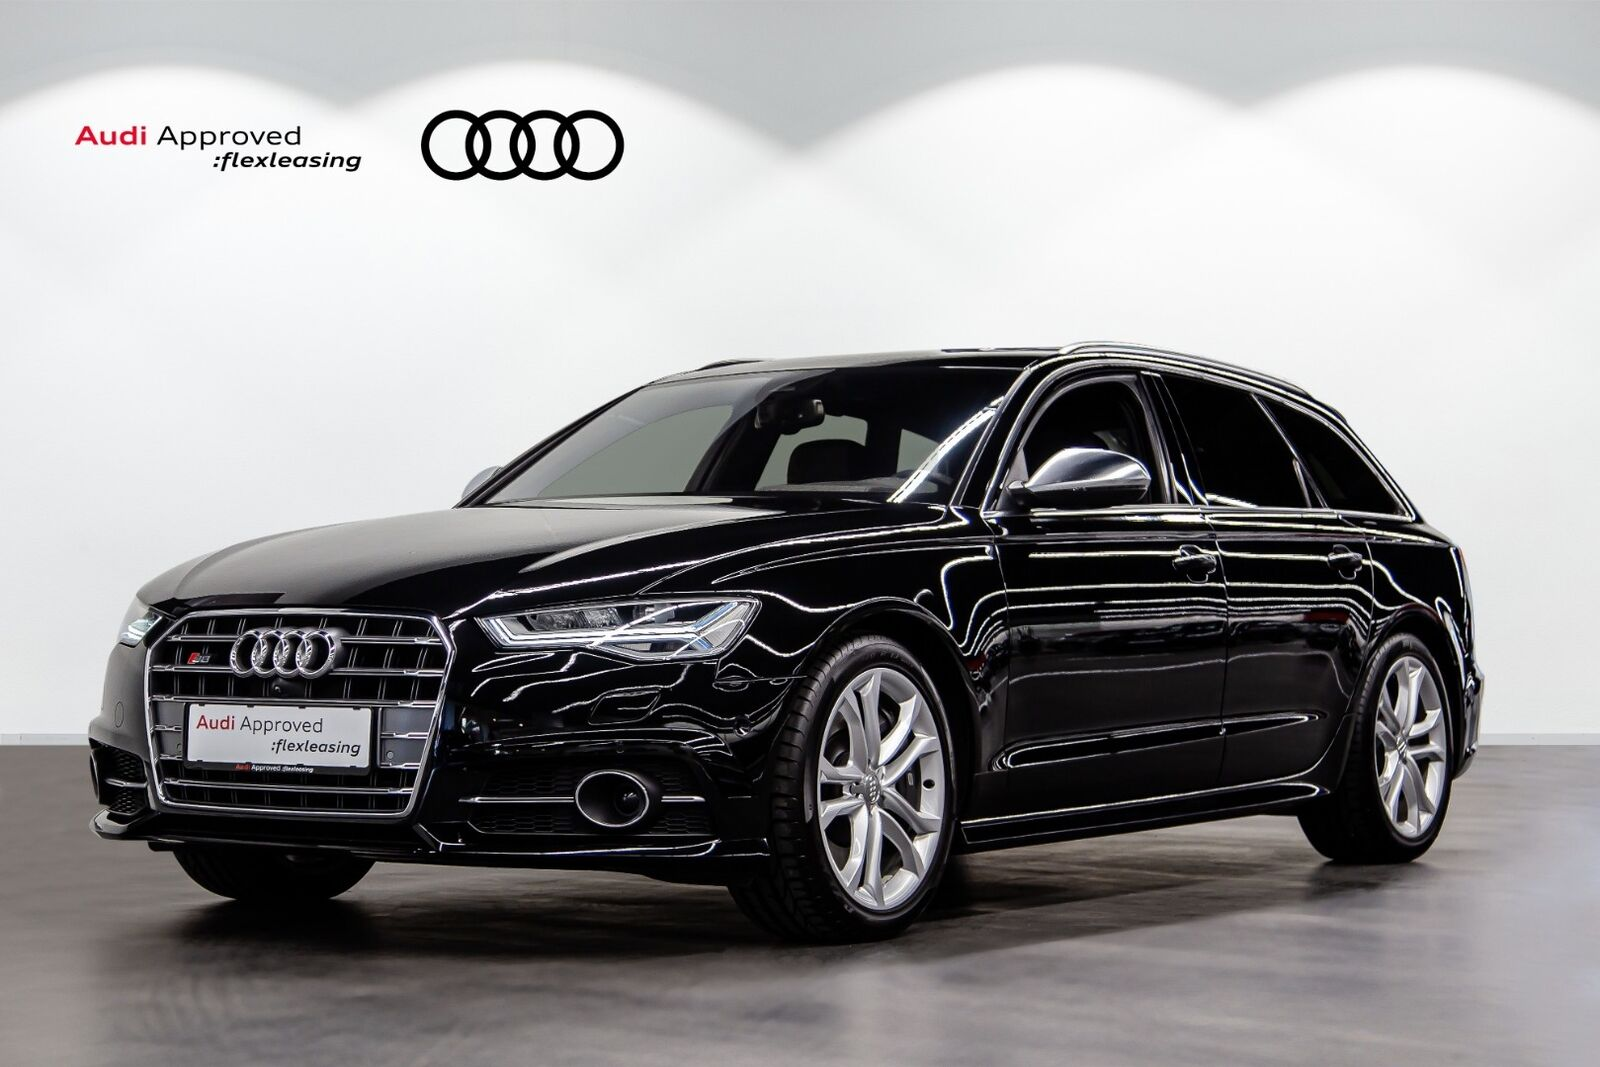 Audi S6 4,0 TFSi Avant quattro S-tr. 5d - 5.457 kr.